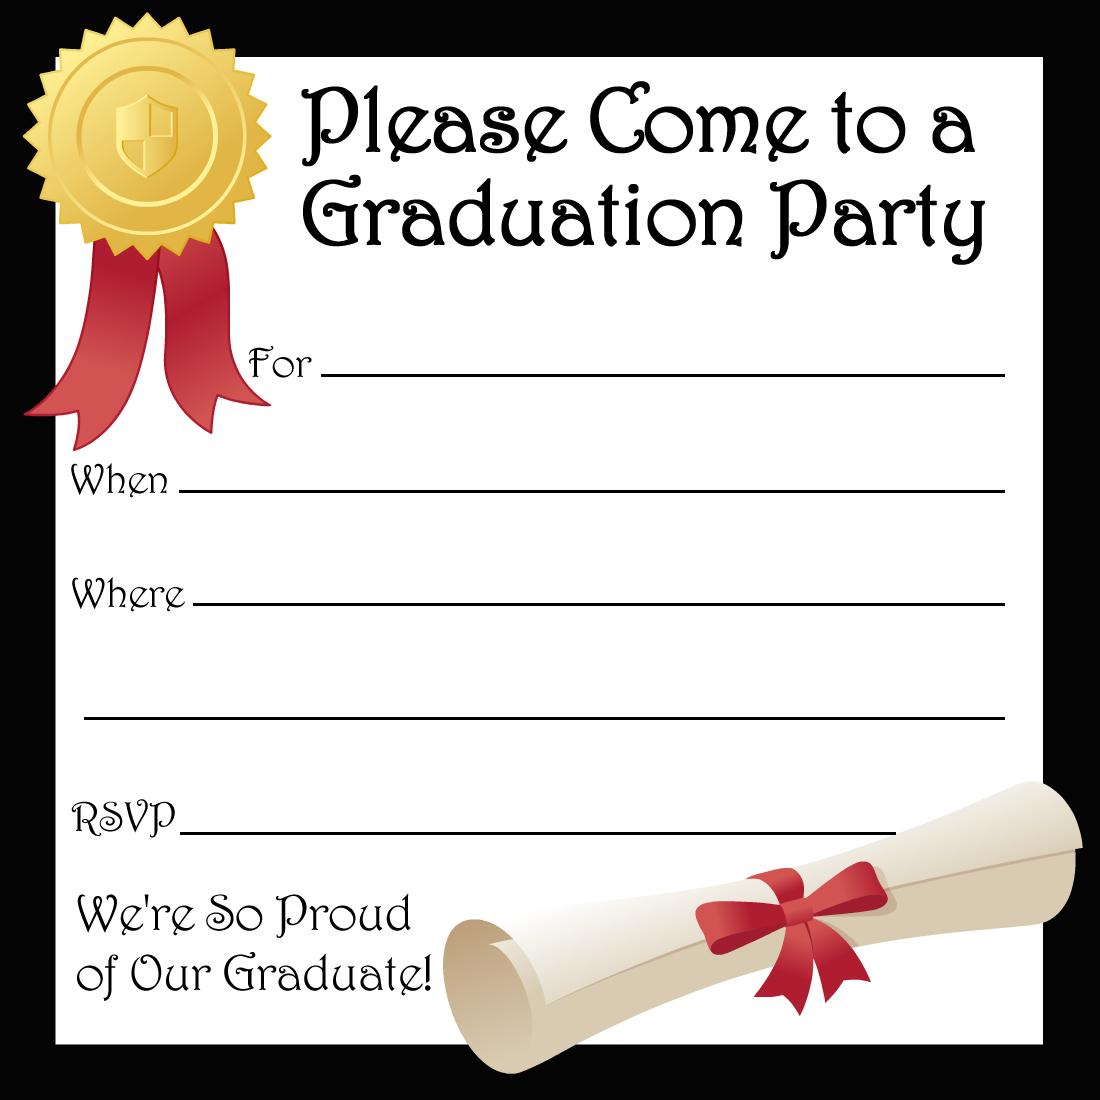 Free Printable Graduation Party Invitations | High School Graduation - Free Printable Graduation Invitations 2018